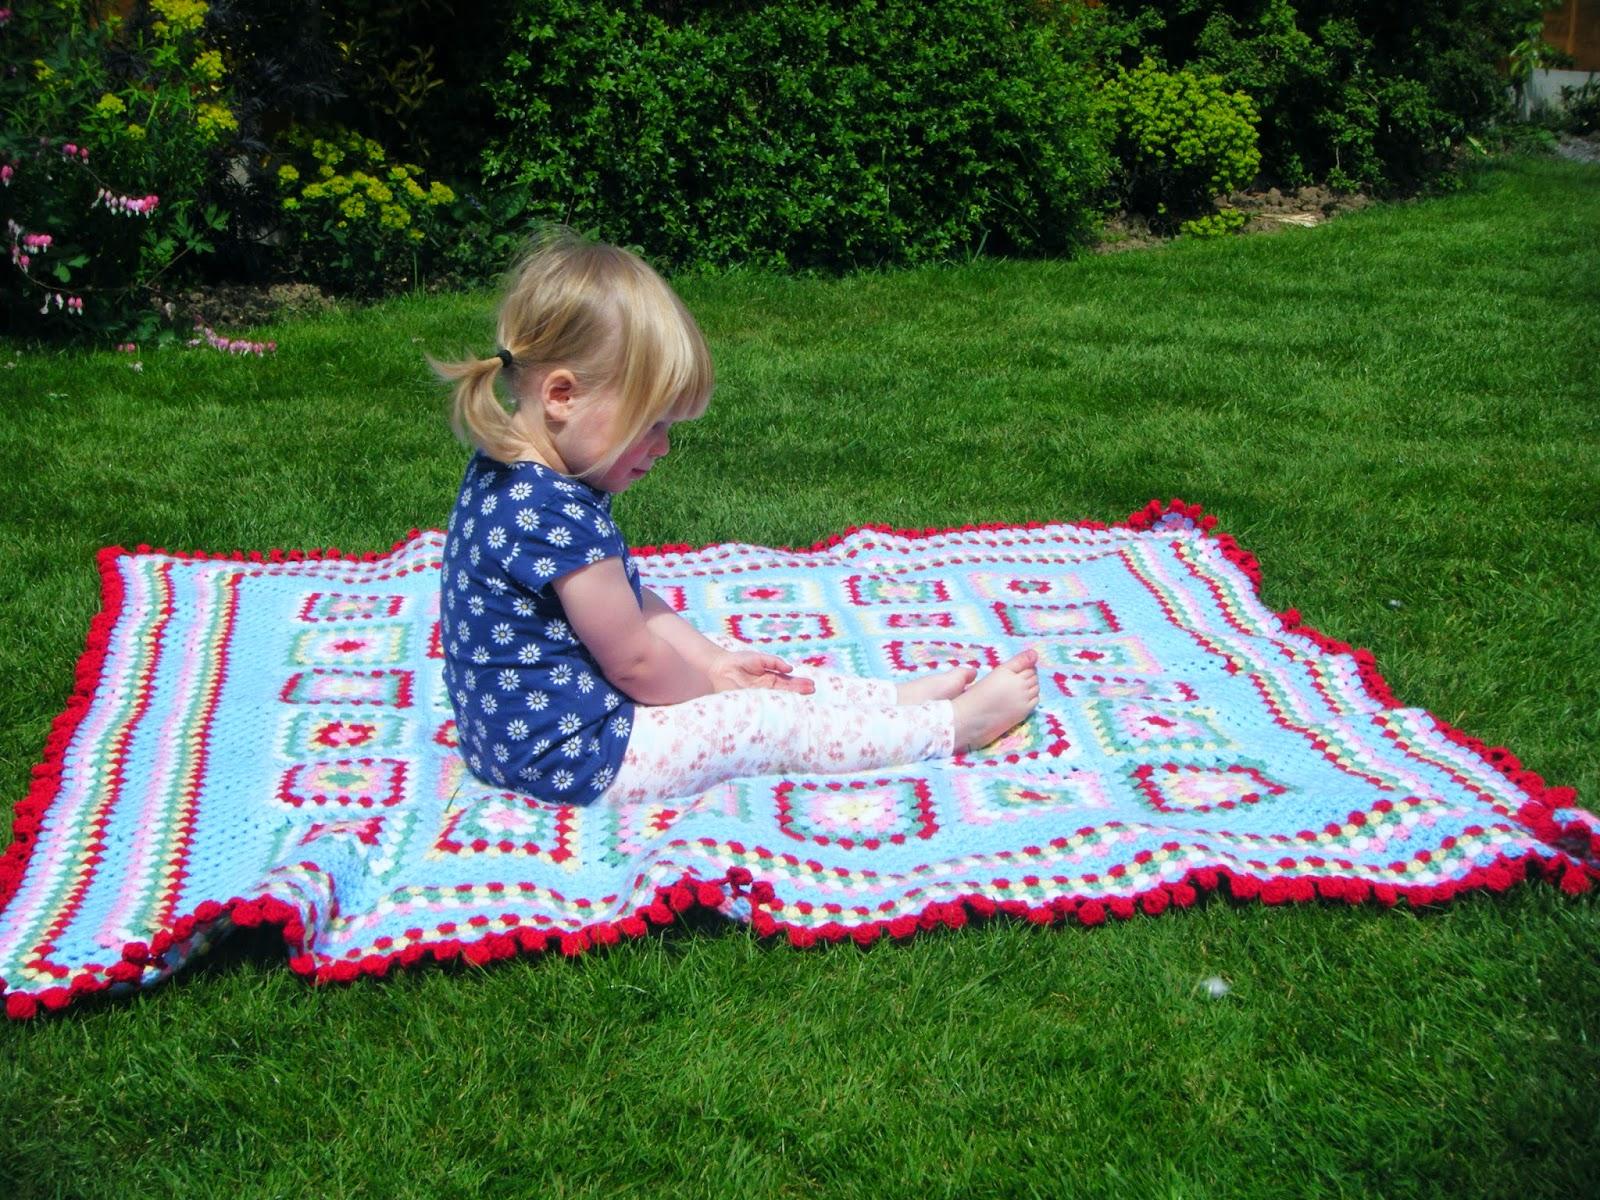 Picnic blanket for Au maison picnic blanket